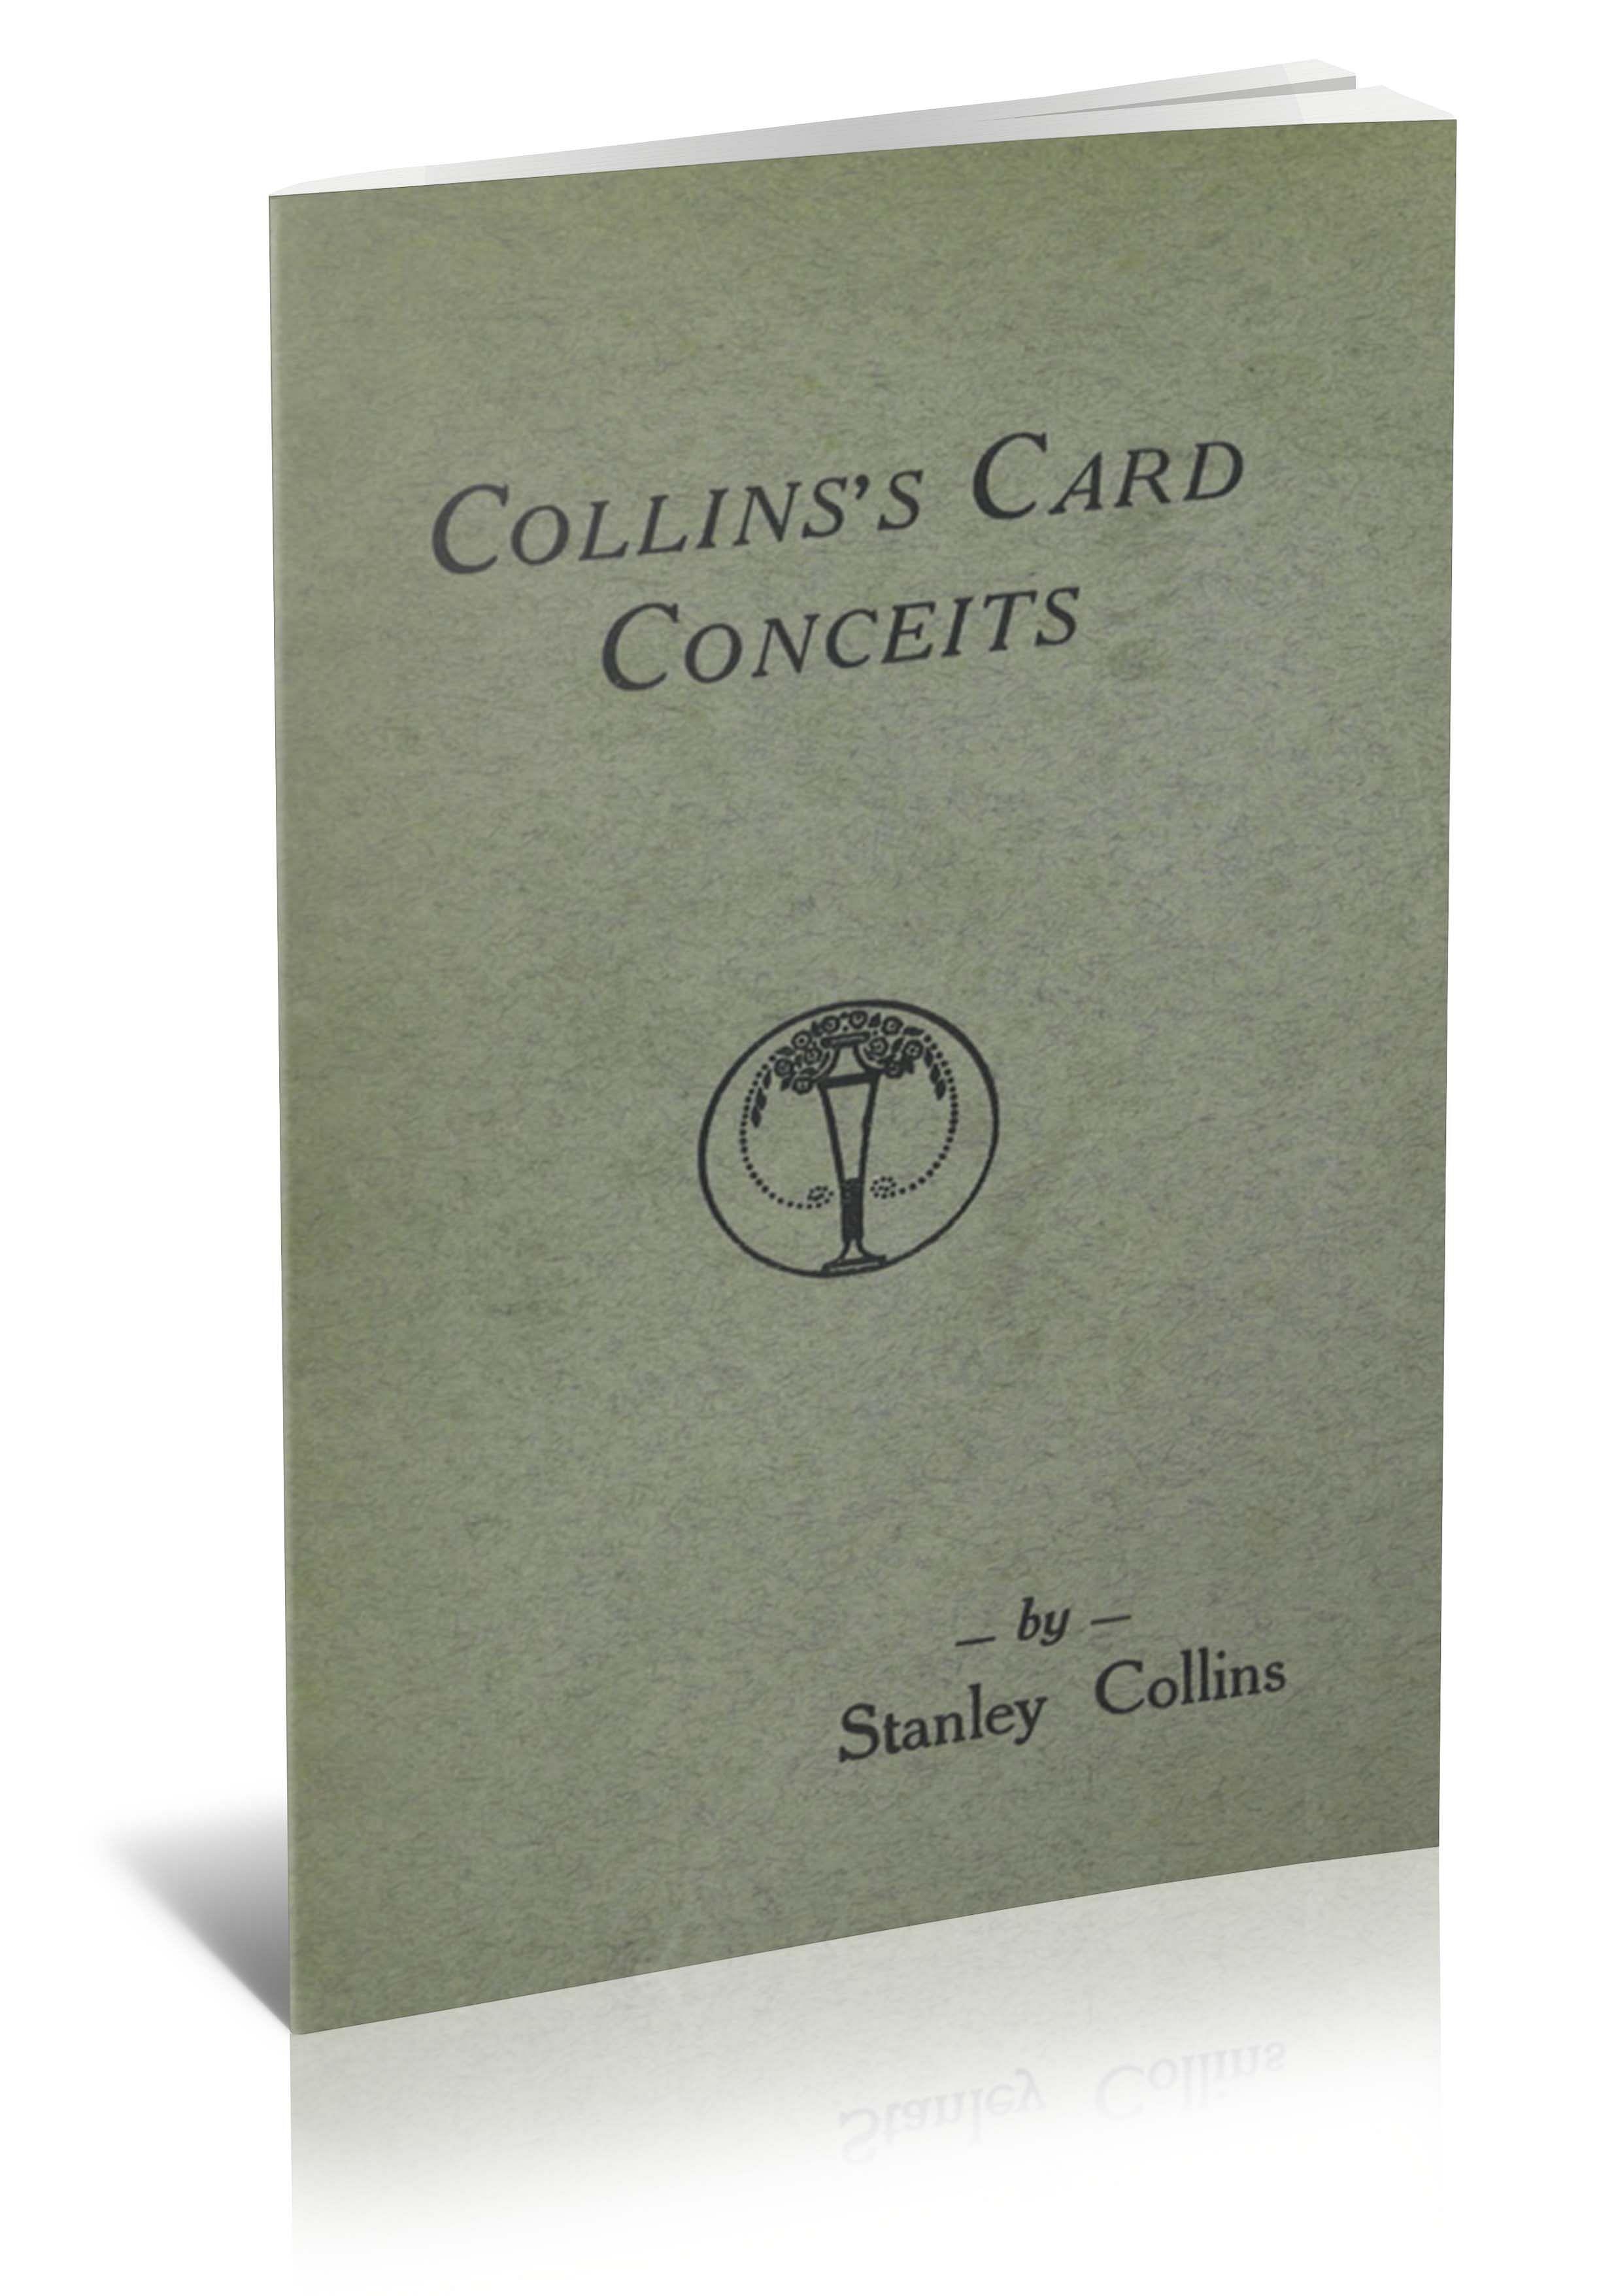 Collins's Card Conceits - magic